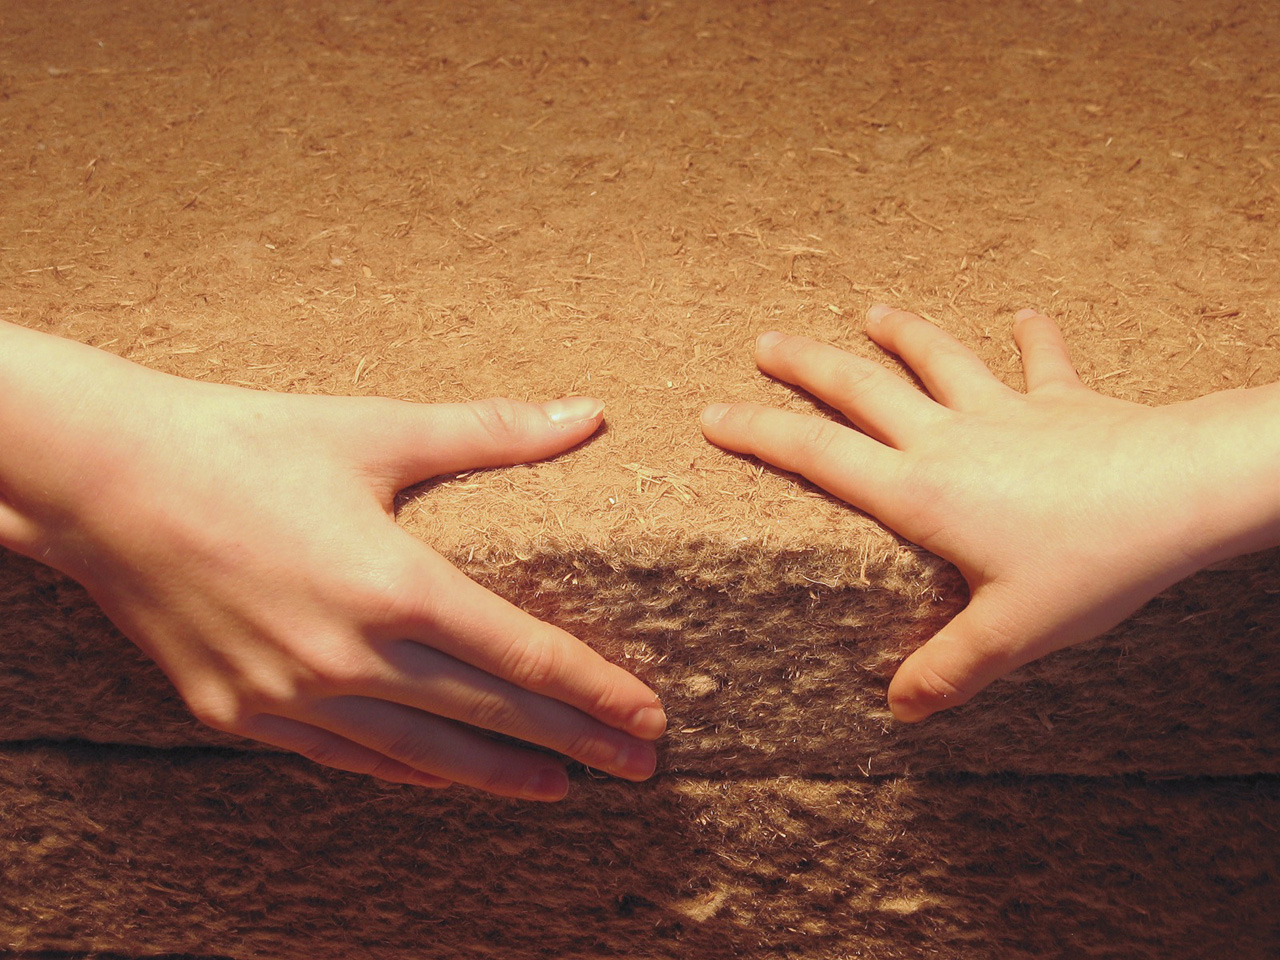 drevovlákno s rukami